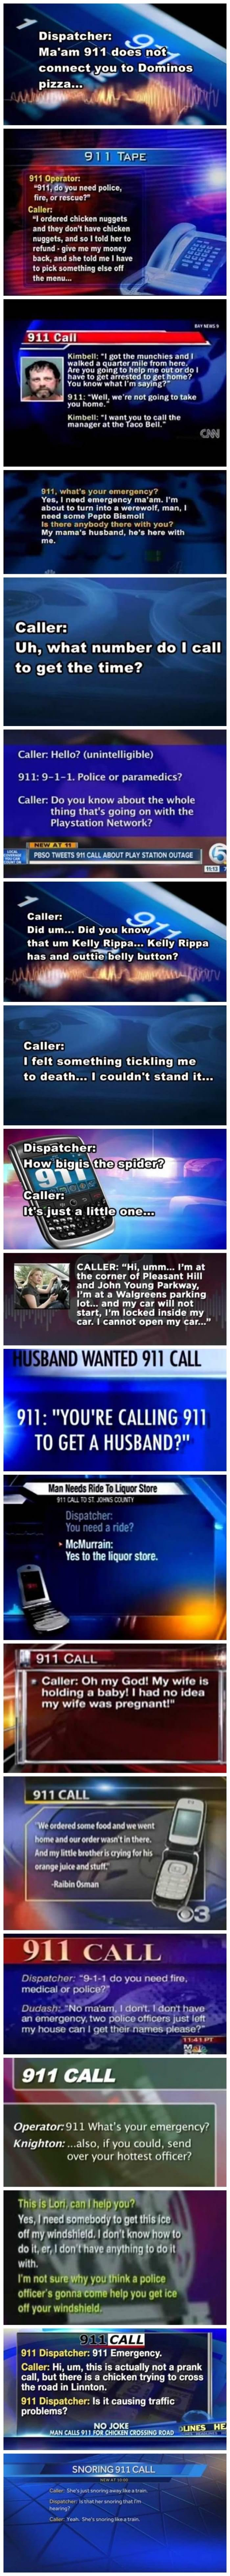 strange 911 calls funny picture